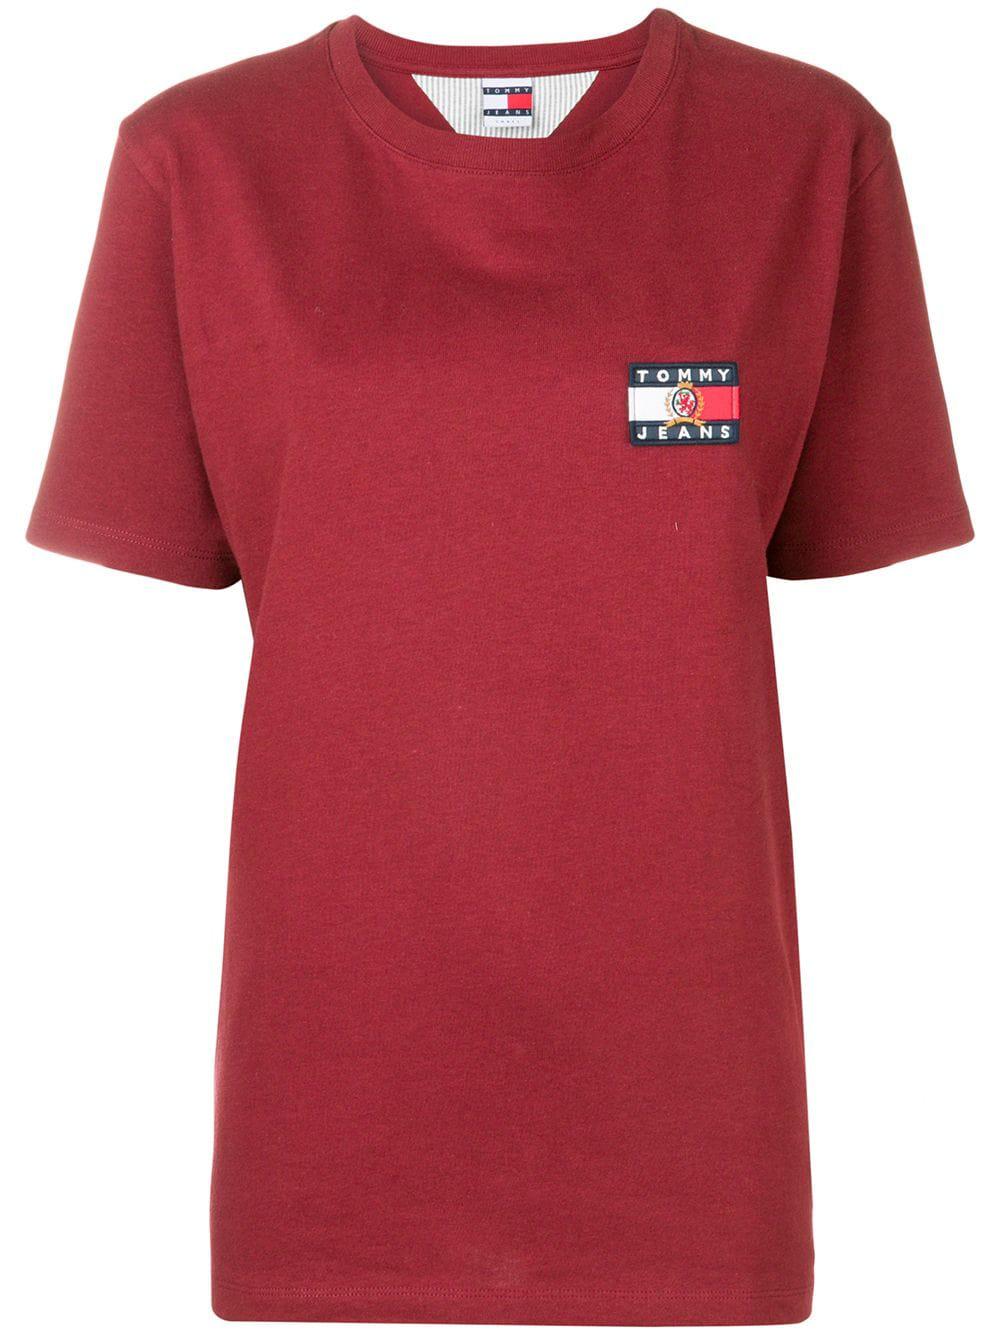 d81a42d4 Tommy Jeans Logo T-Shirt - Red | ModeSens